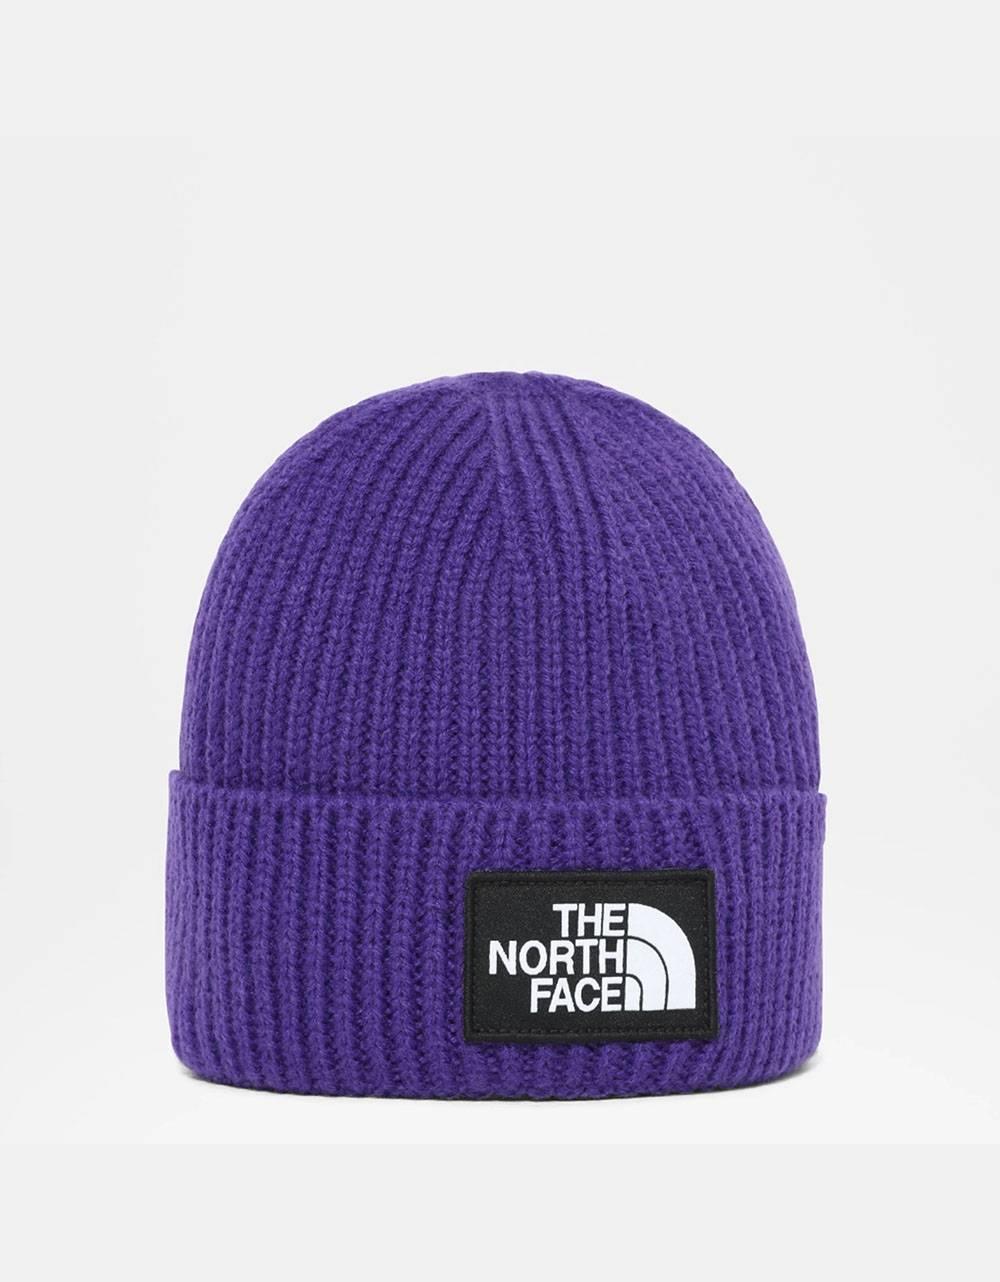 The North Face box logo cuff regular beanie - peak purple THE NORTH FACE Beanie 35,00€